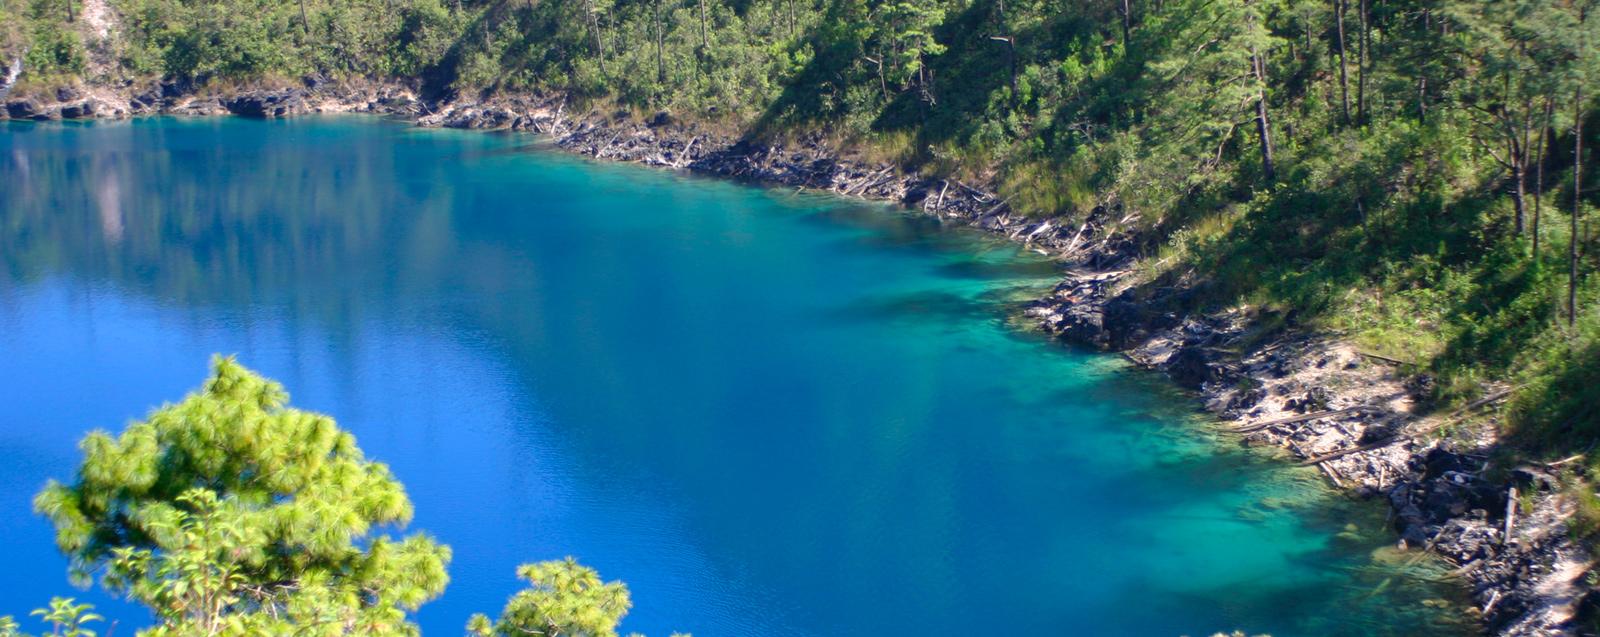 Casas y terrenos cerca de los lagos de montebello chiapas for Lagunas para cachamas